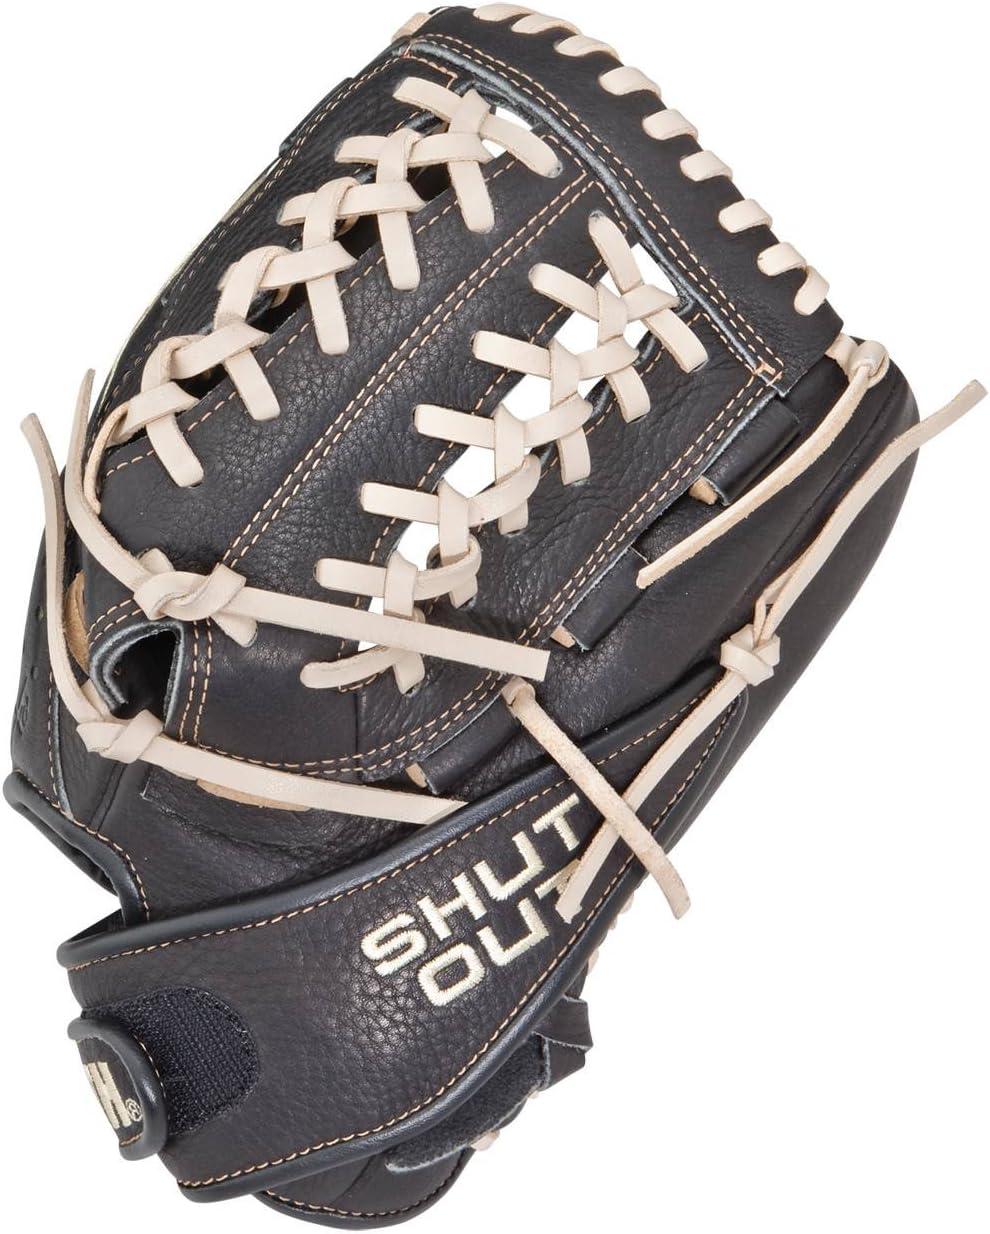 Worth SO120FPX Black 12-Inch Glove